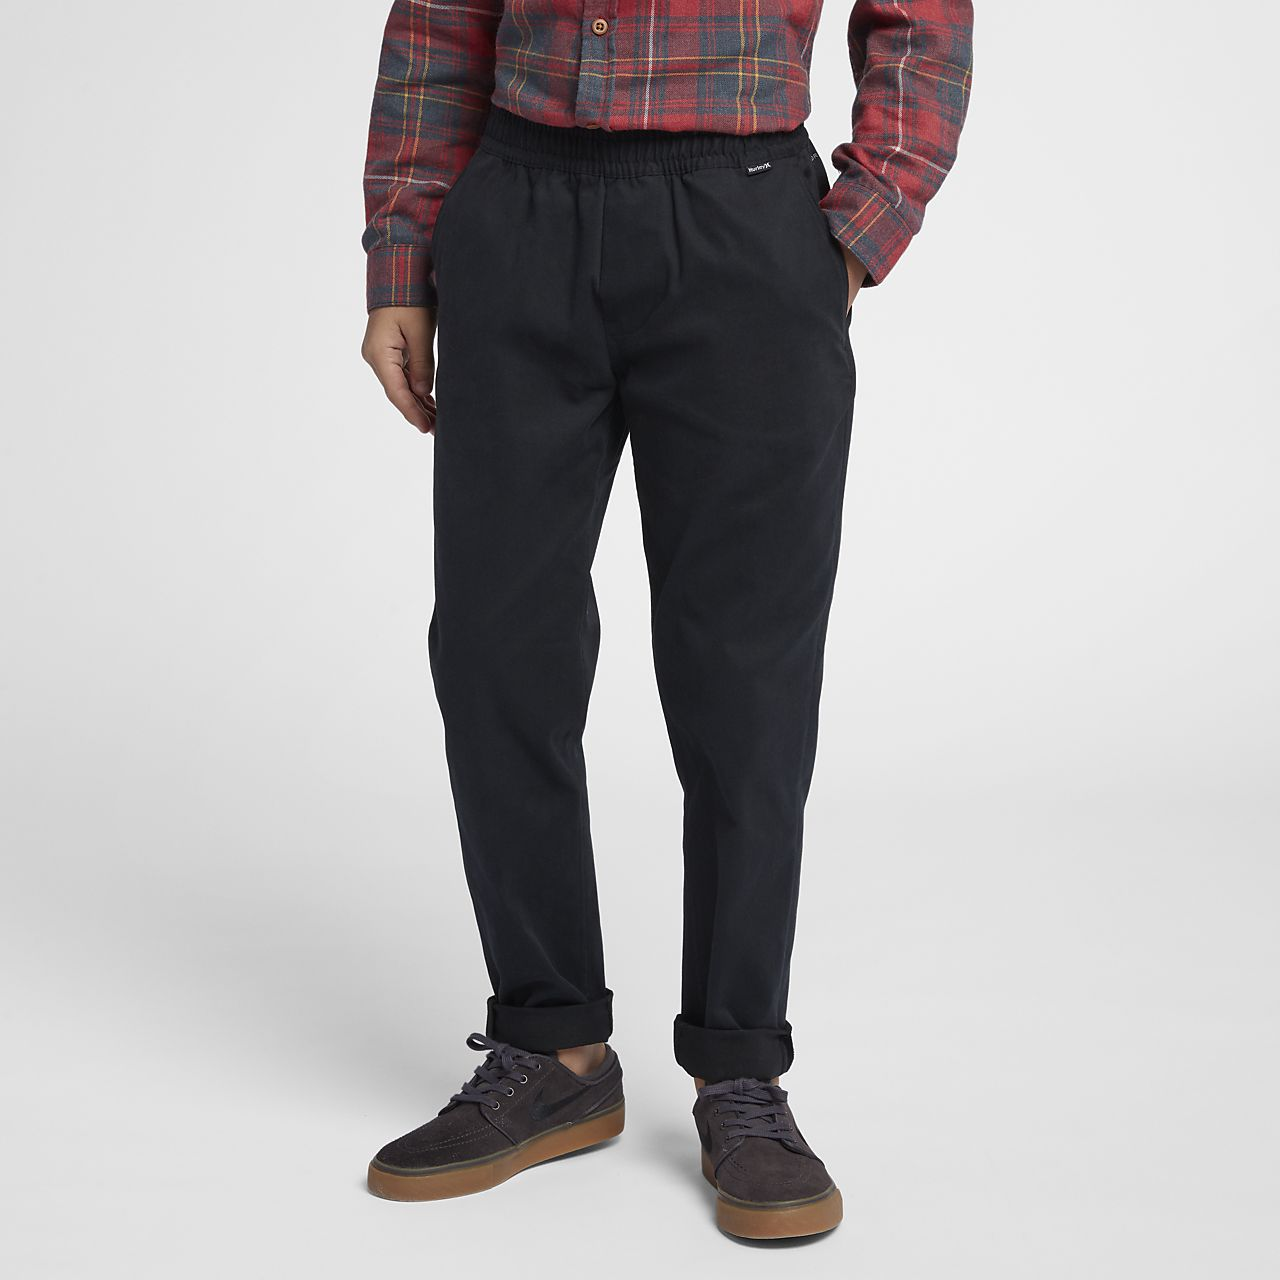 Pantalones para niños Hurley Dri-FIT Ditch